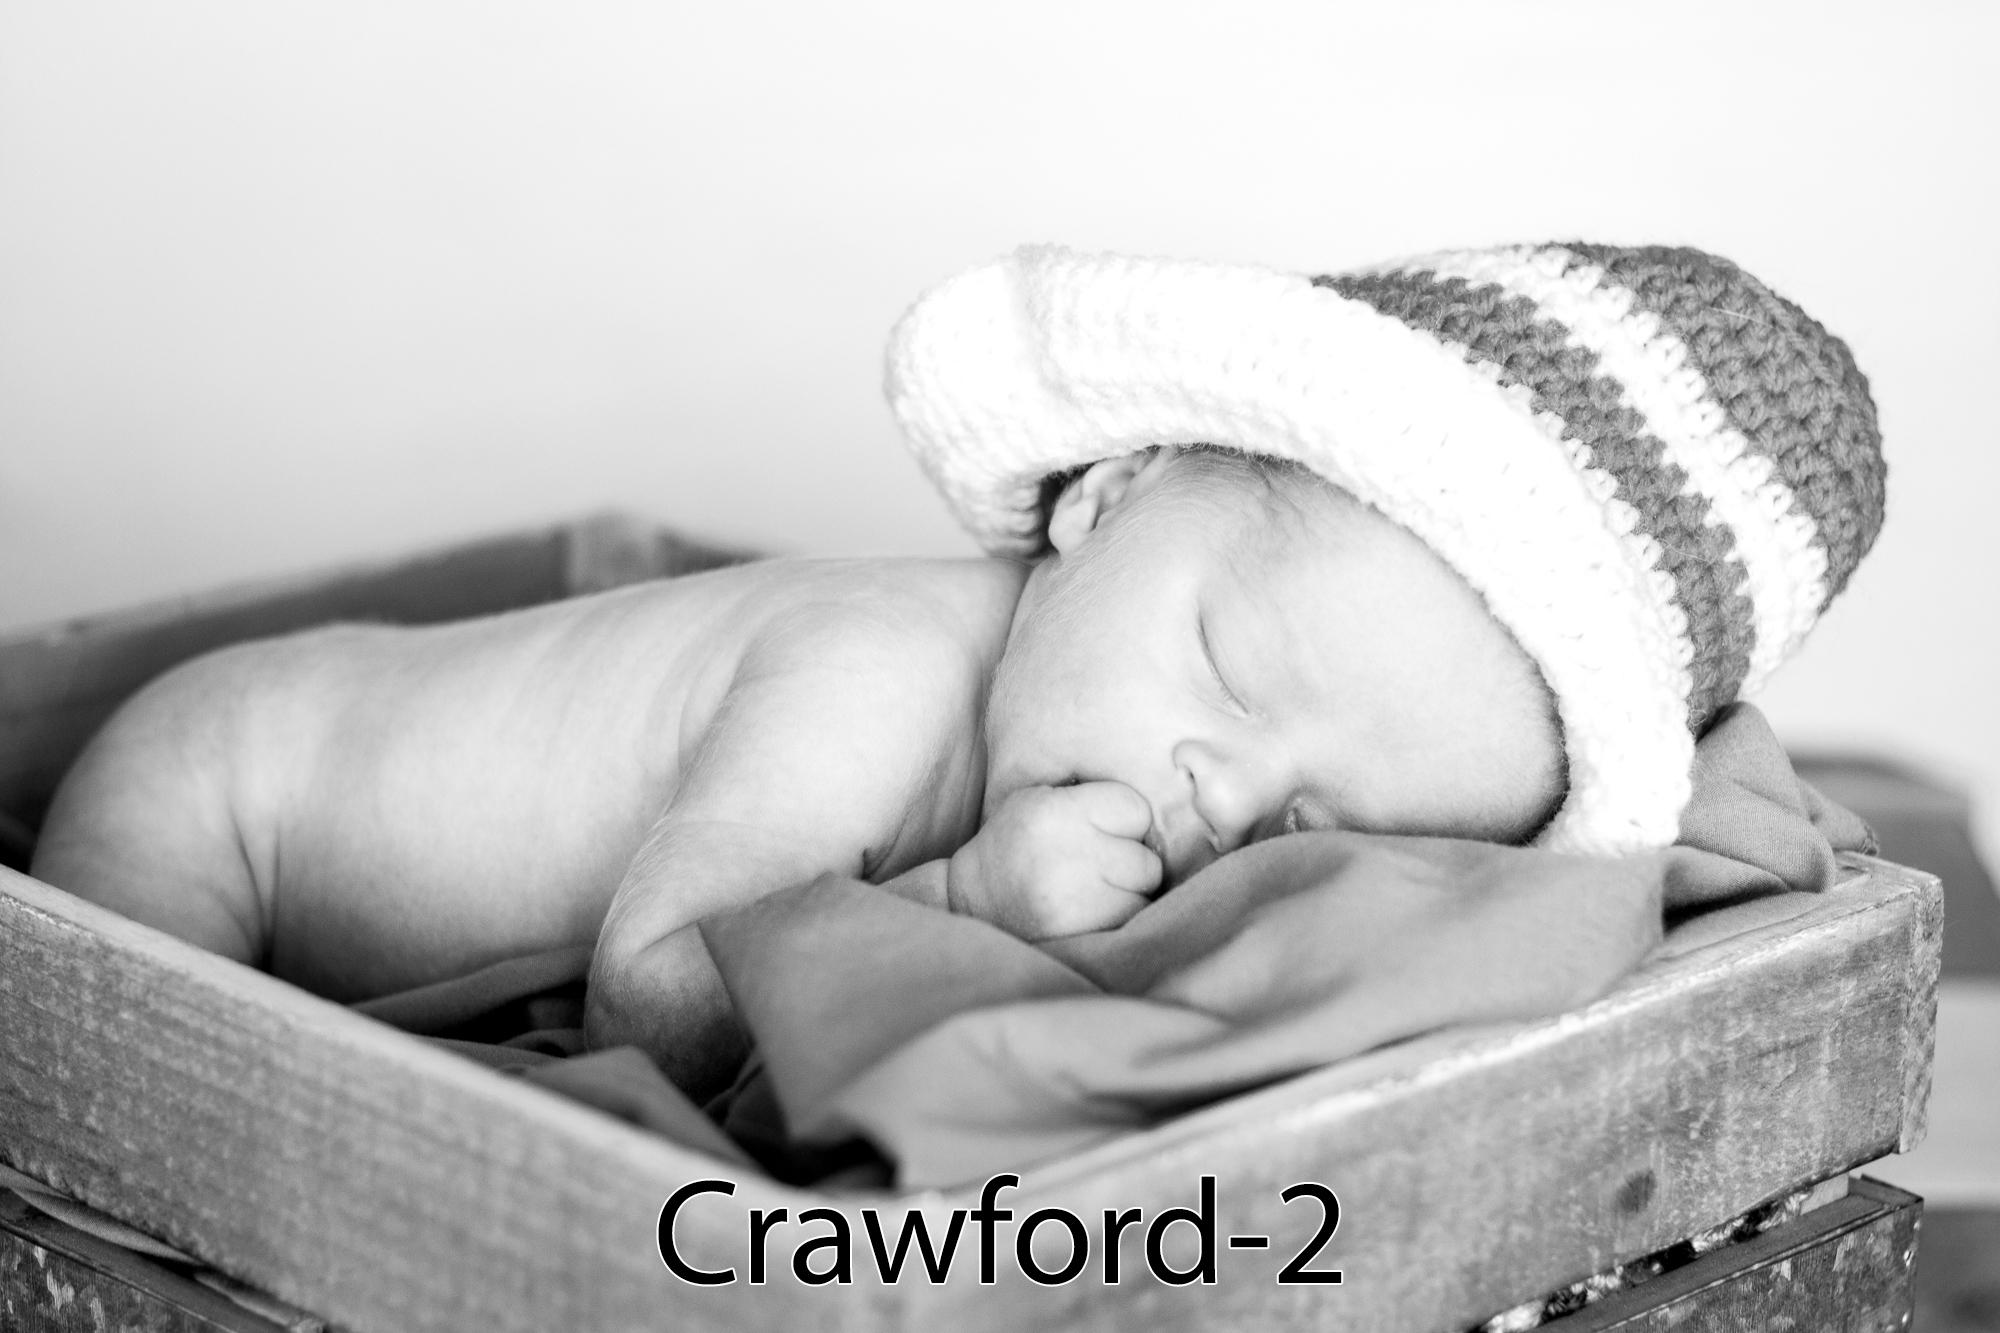 Crawford-2.jpg